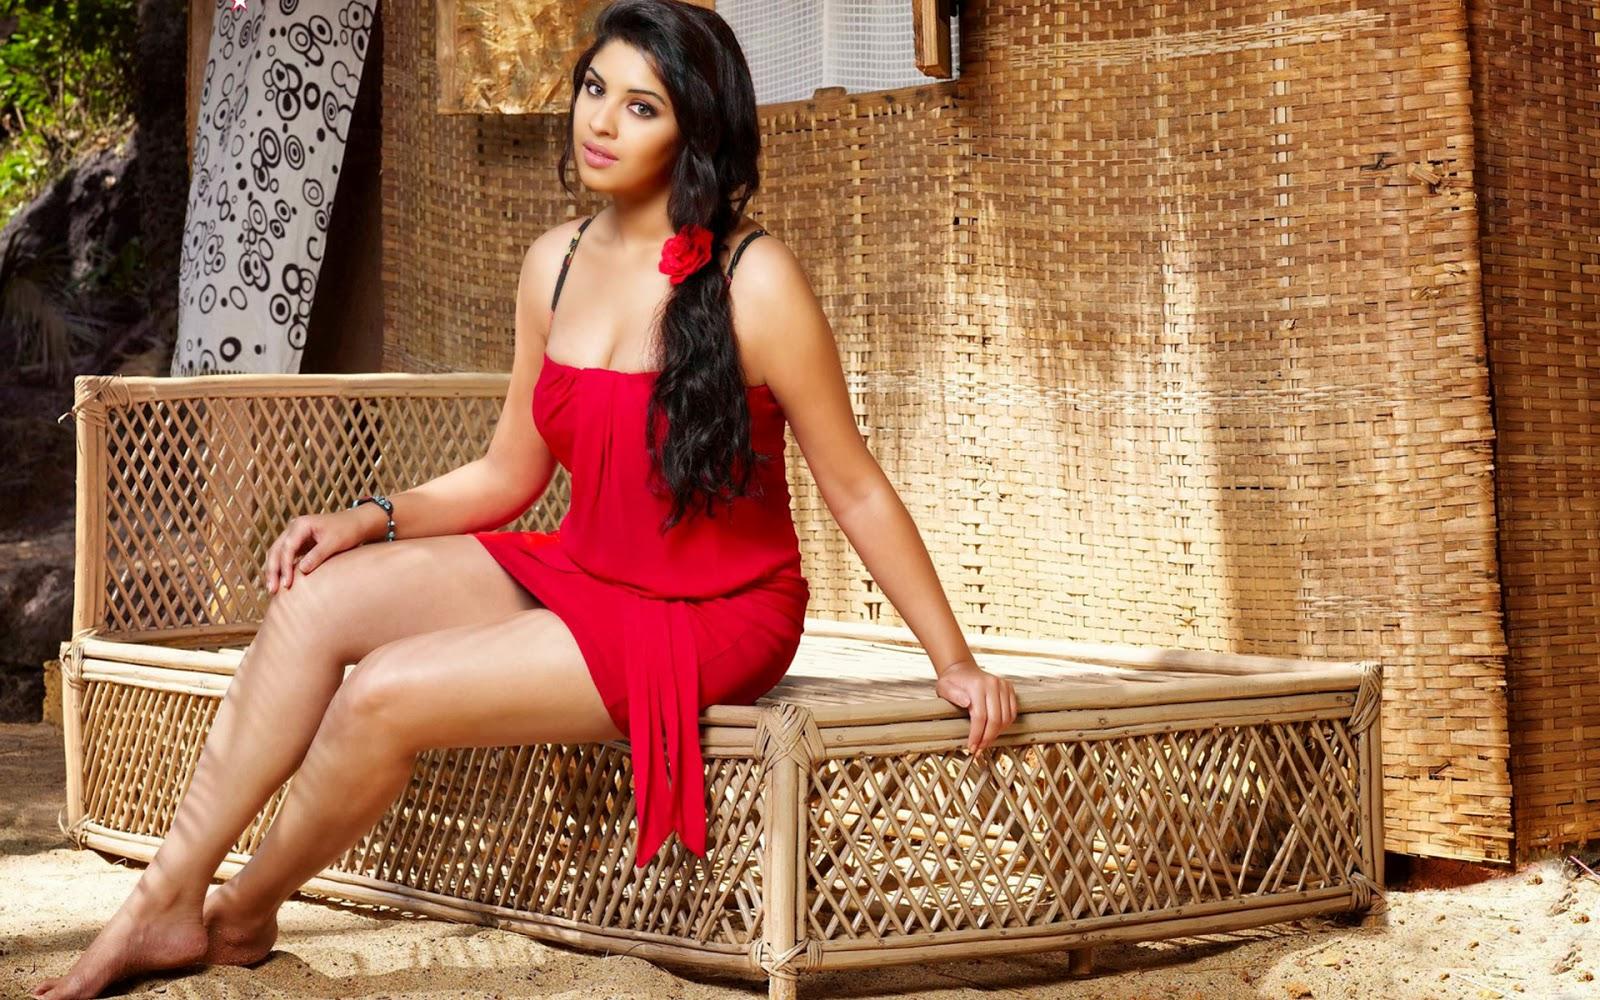 Bollywood Hd Wallpapers 1080P Tollywood Actress Hd Wallpapers-1029